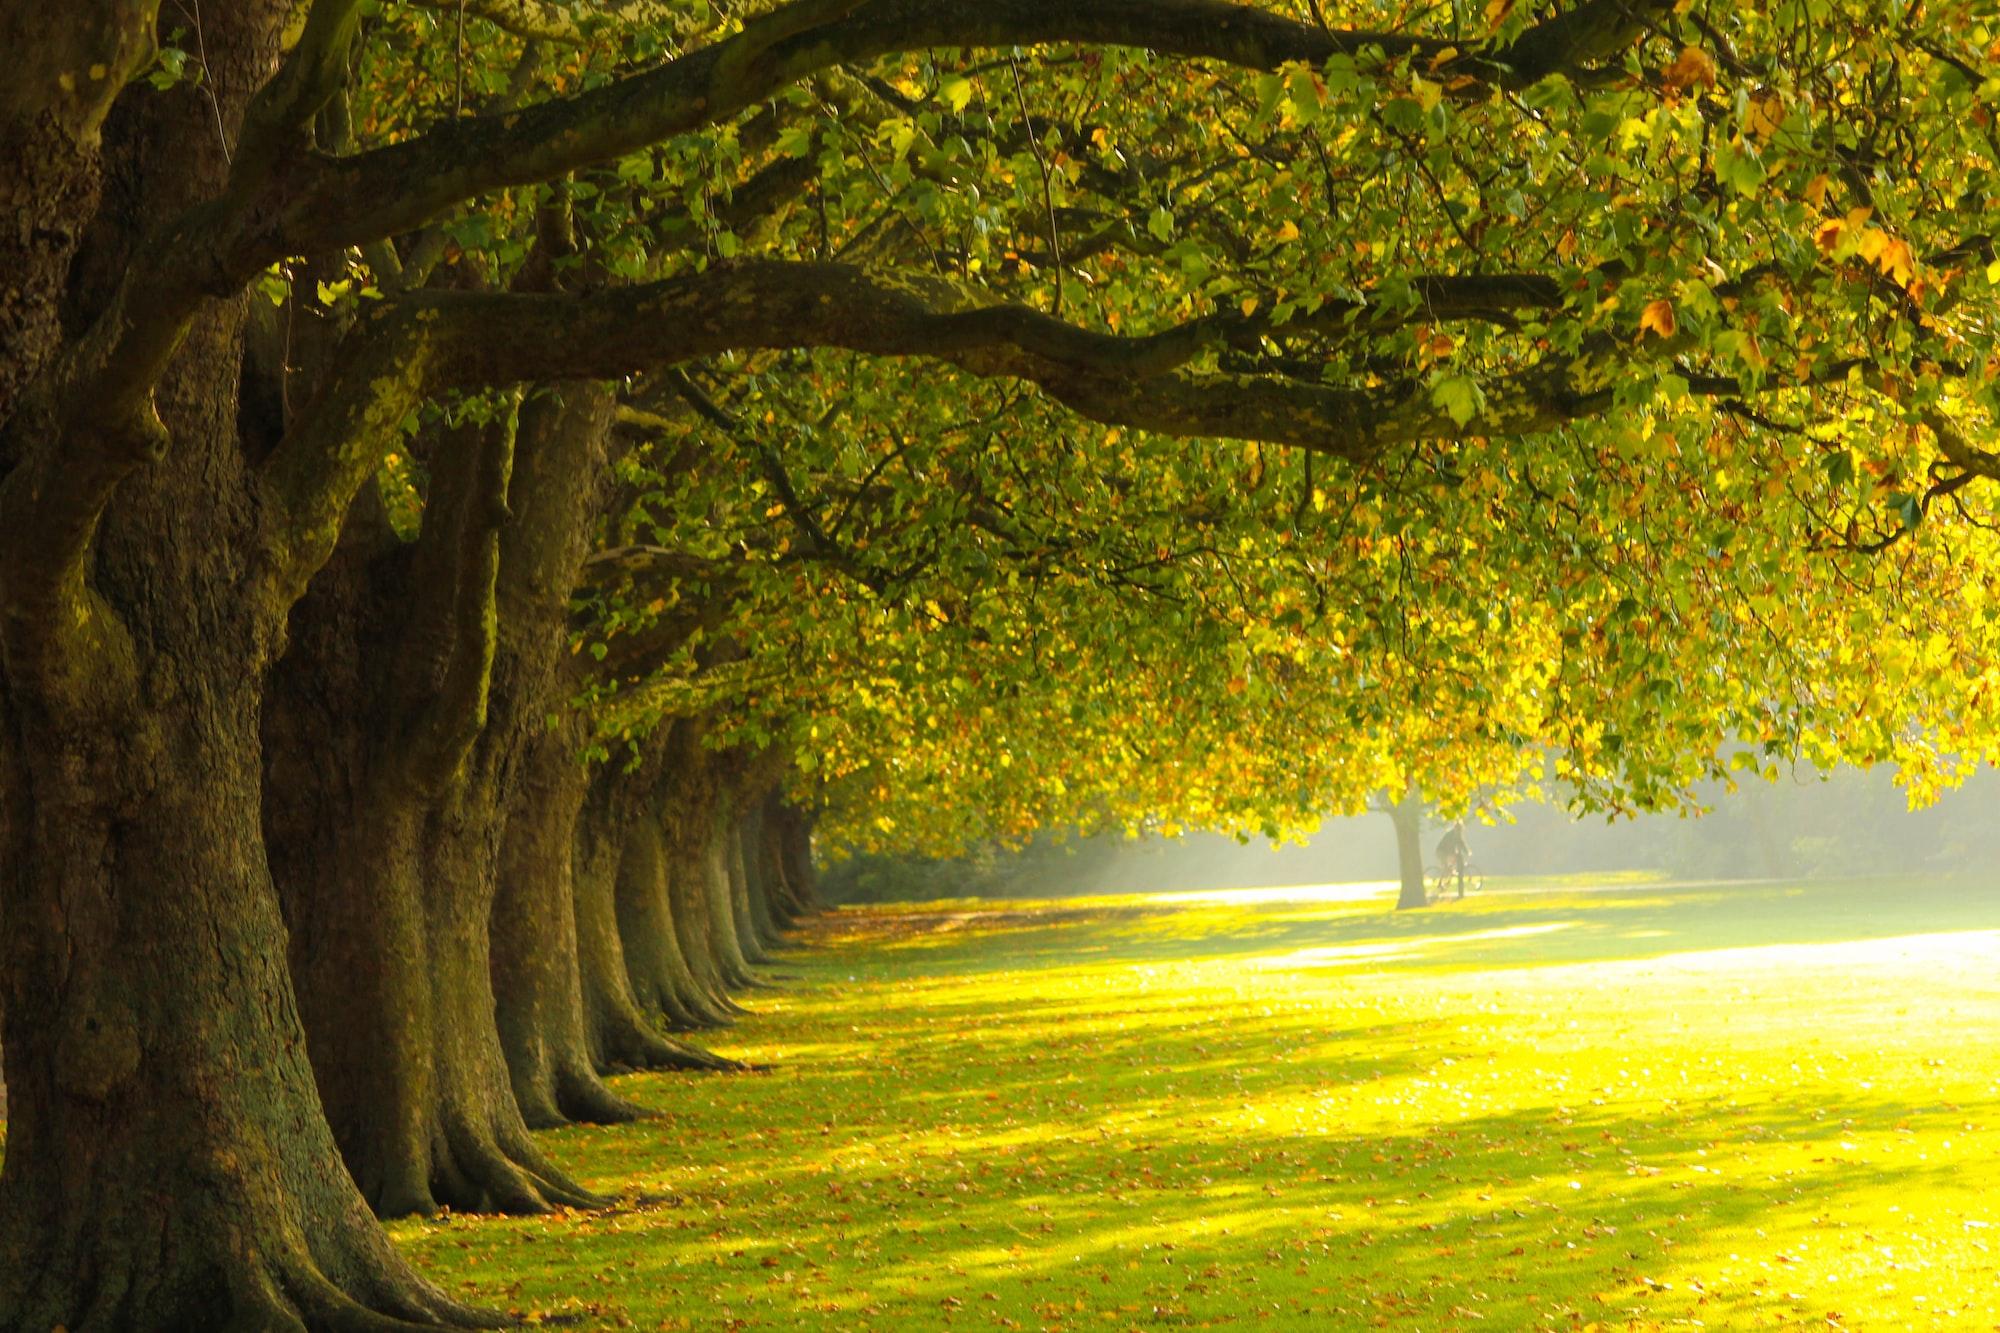 Jesus Green, Cambridge, UK